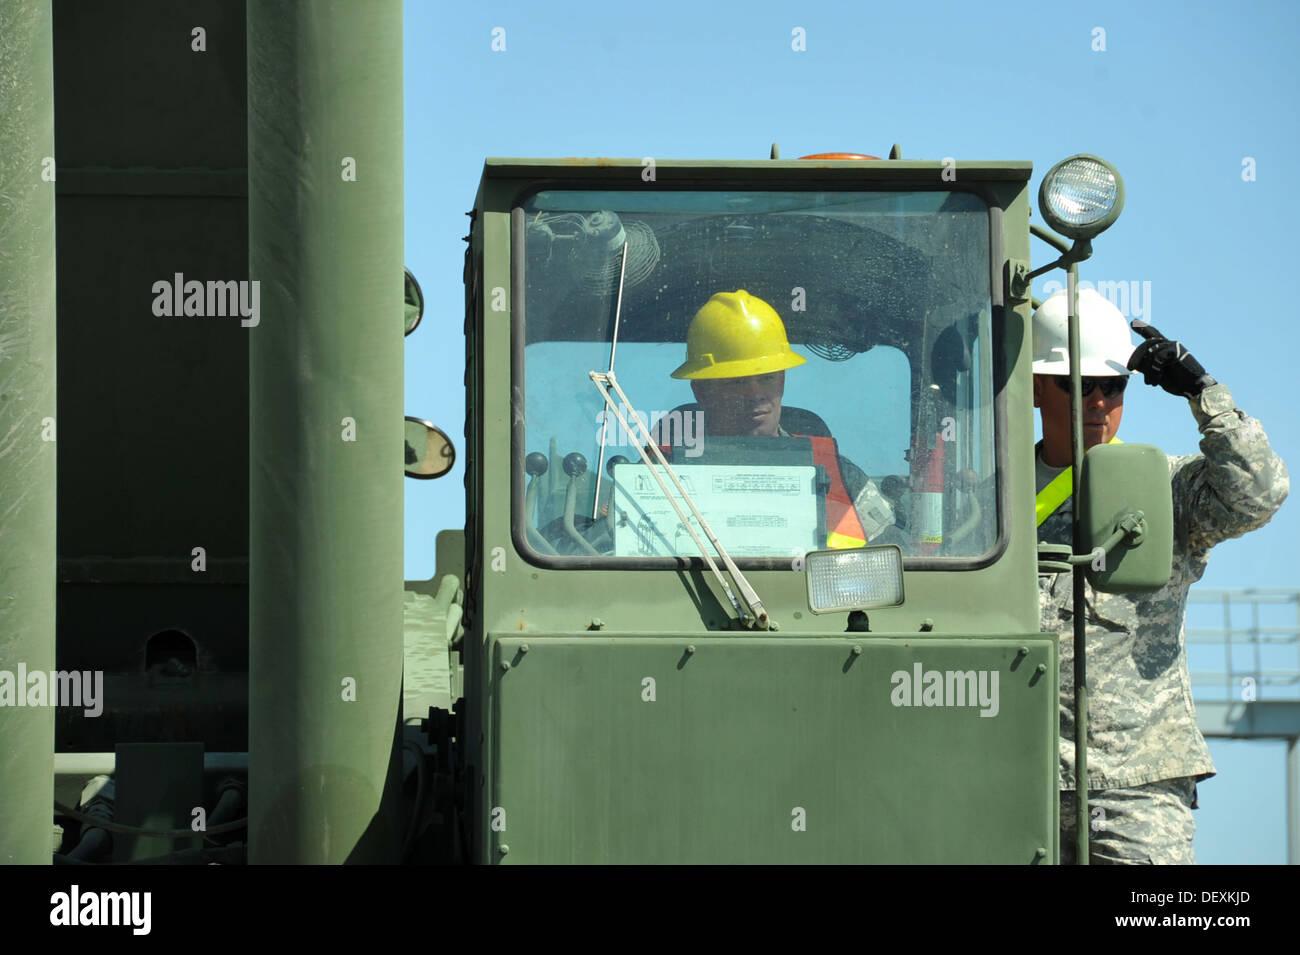 PORT HUENEME, Calif. – U.S. Army Reserve Spc. Gary Borne, right, mentors Spc. Steven Looney, left, both cargo specialists assign - Stock Image